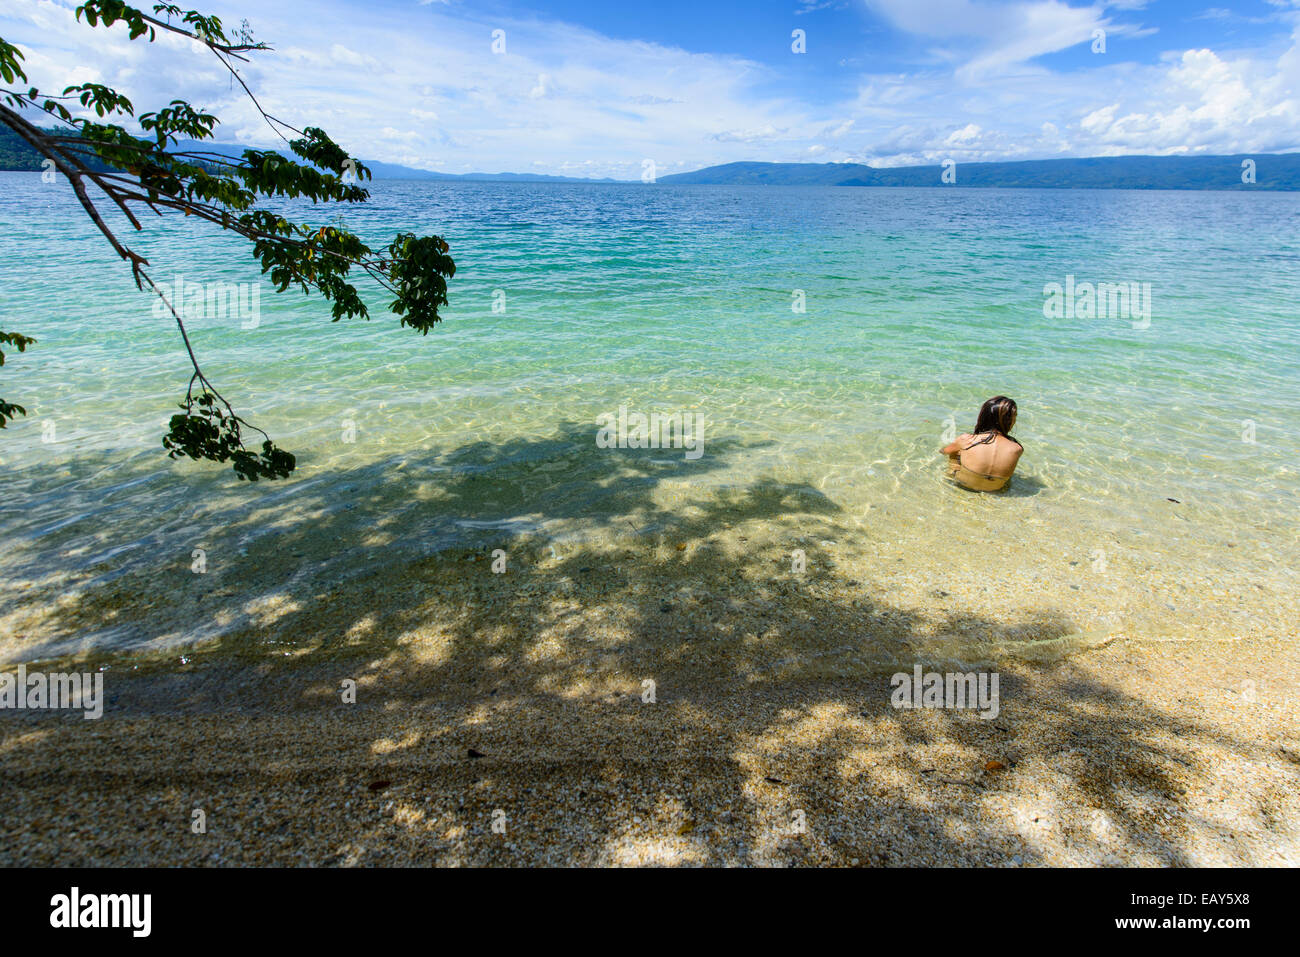 Girl on the beach, Lake Danau Poso, Sulawesi, Indonesia - Stock Image